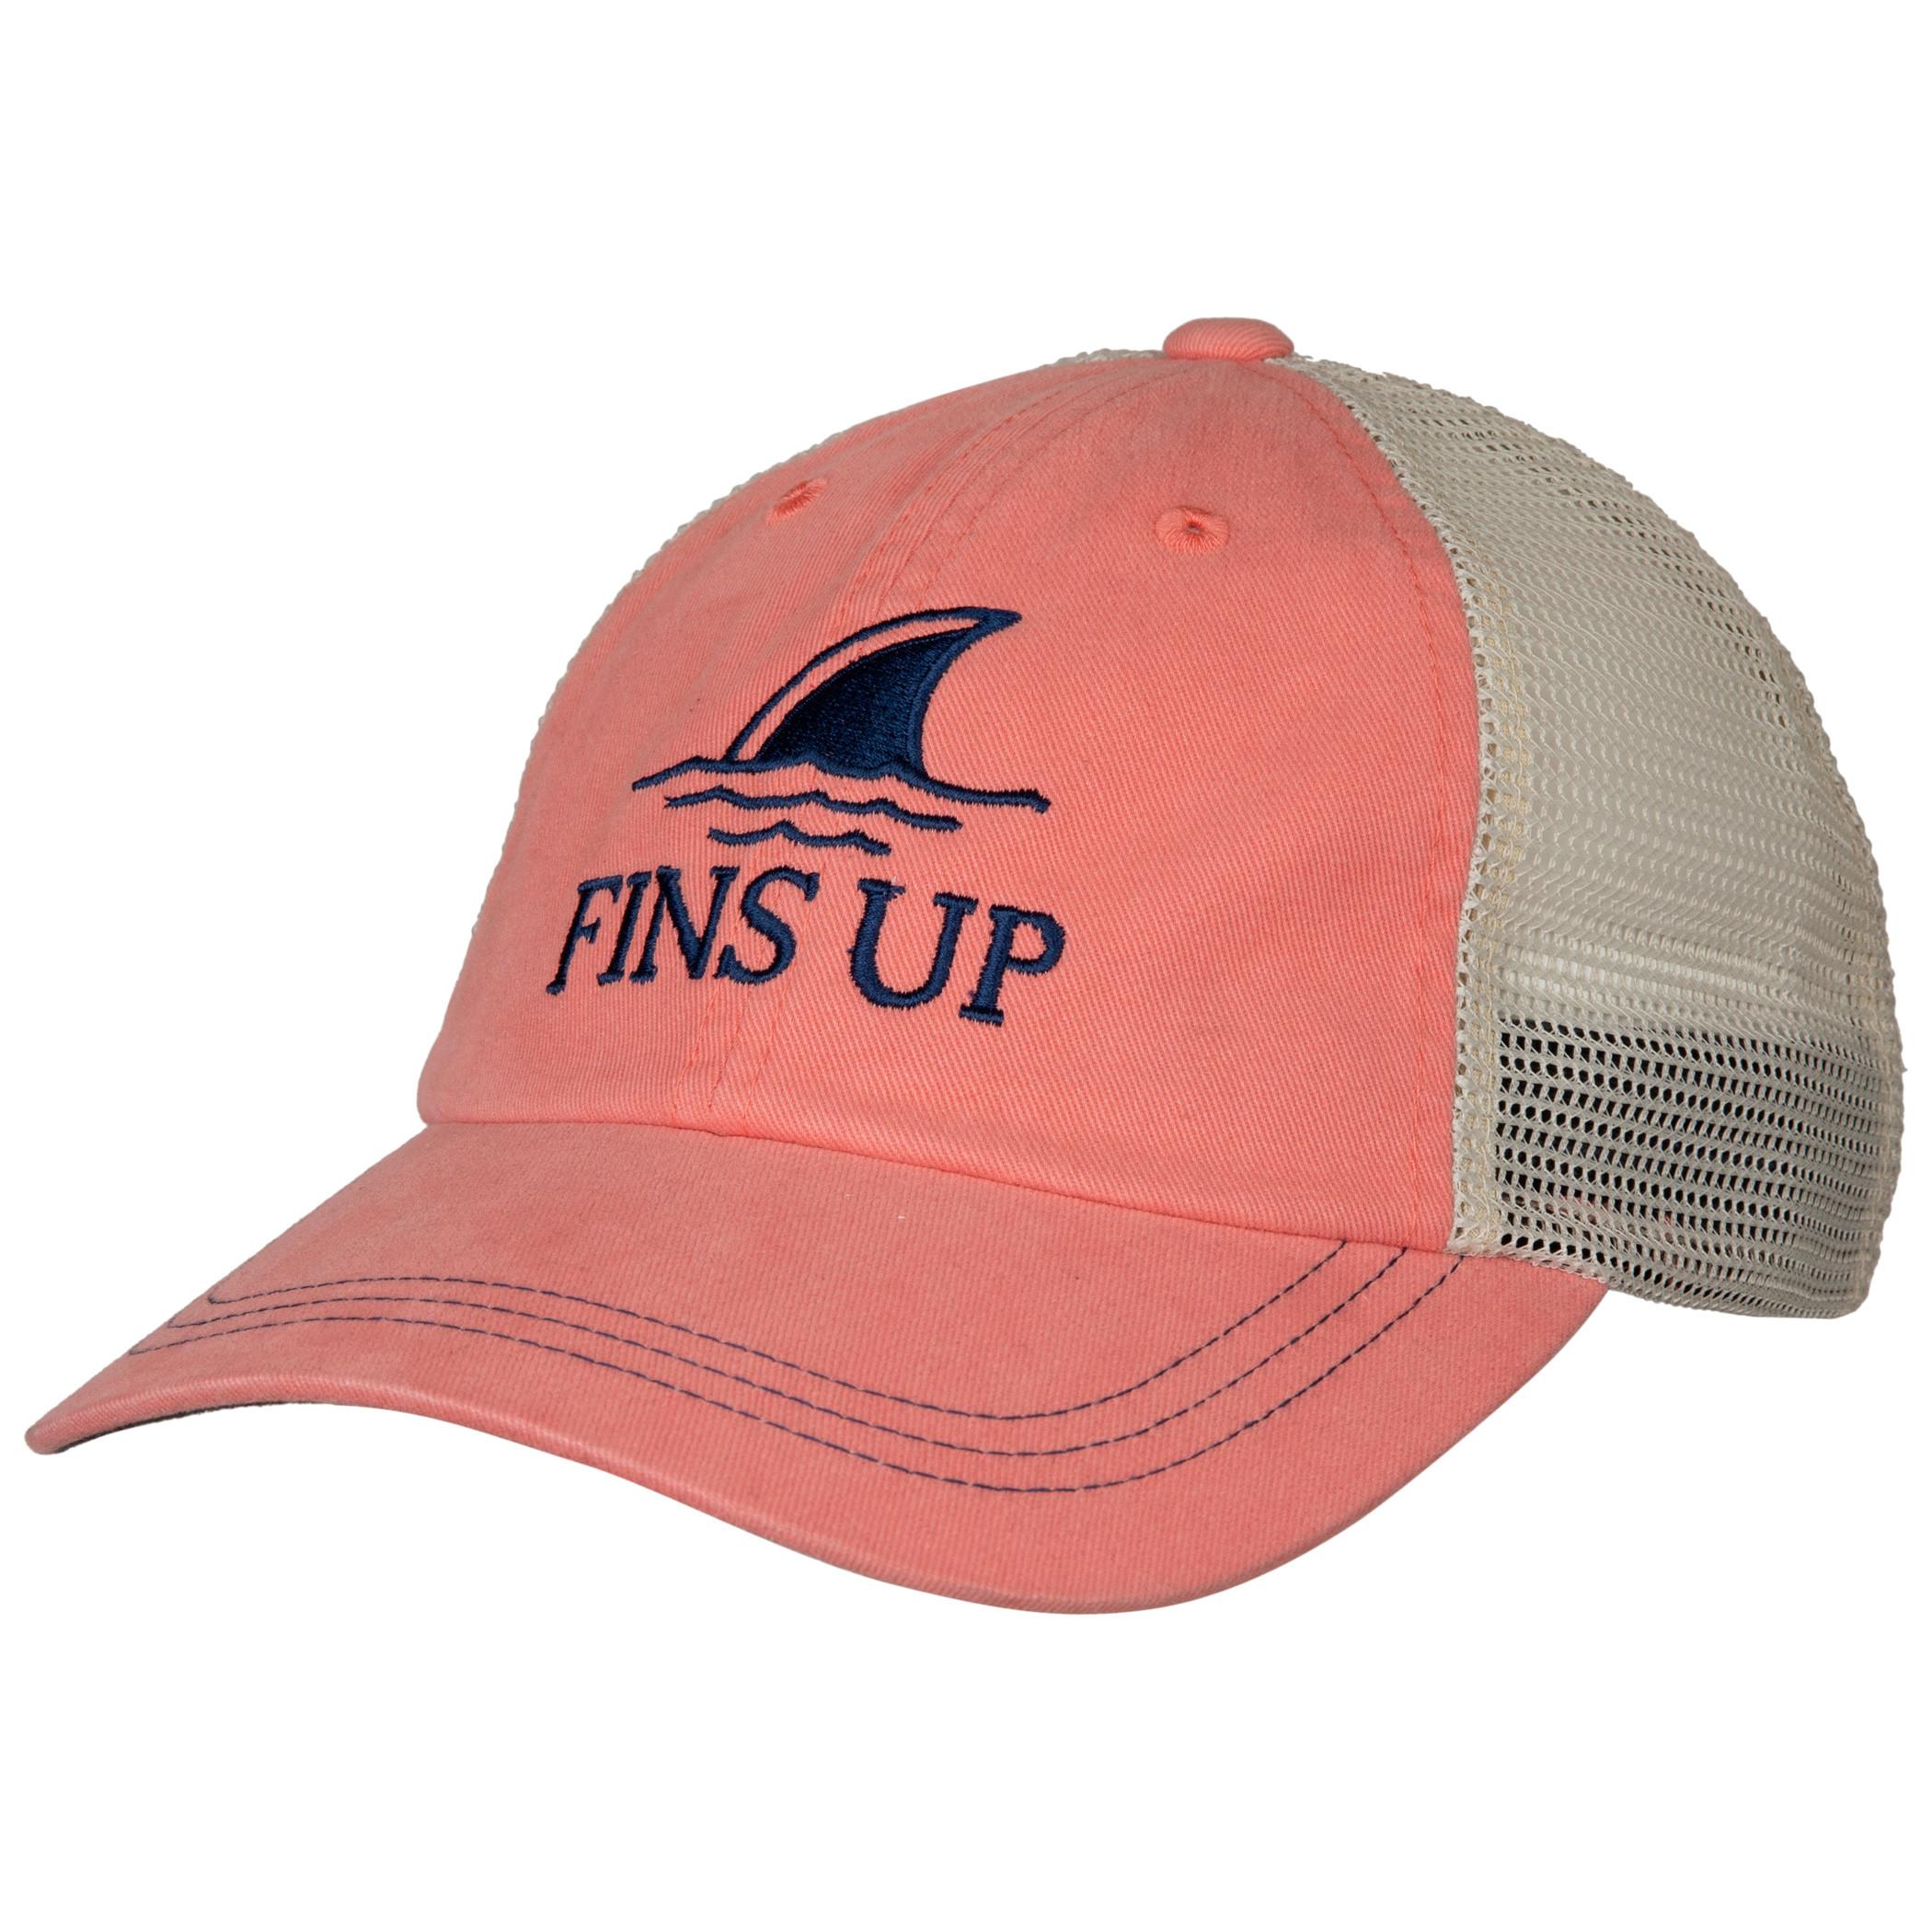 Landshark Fins Up Salmon Colorway Adjustable Hat